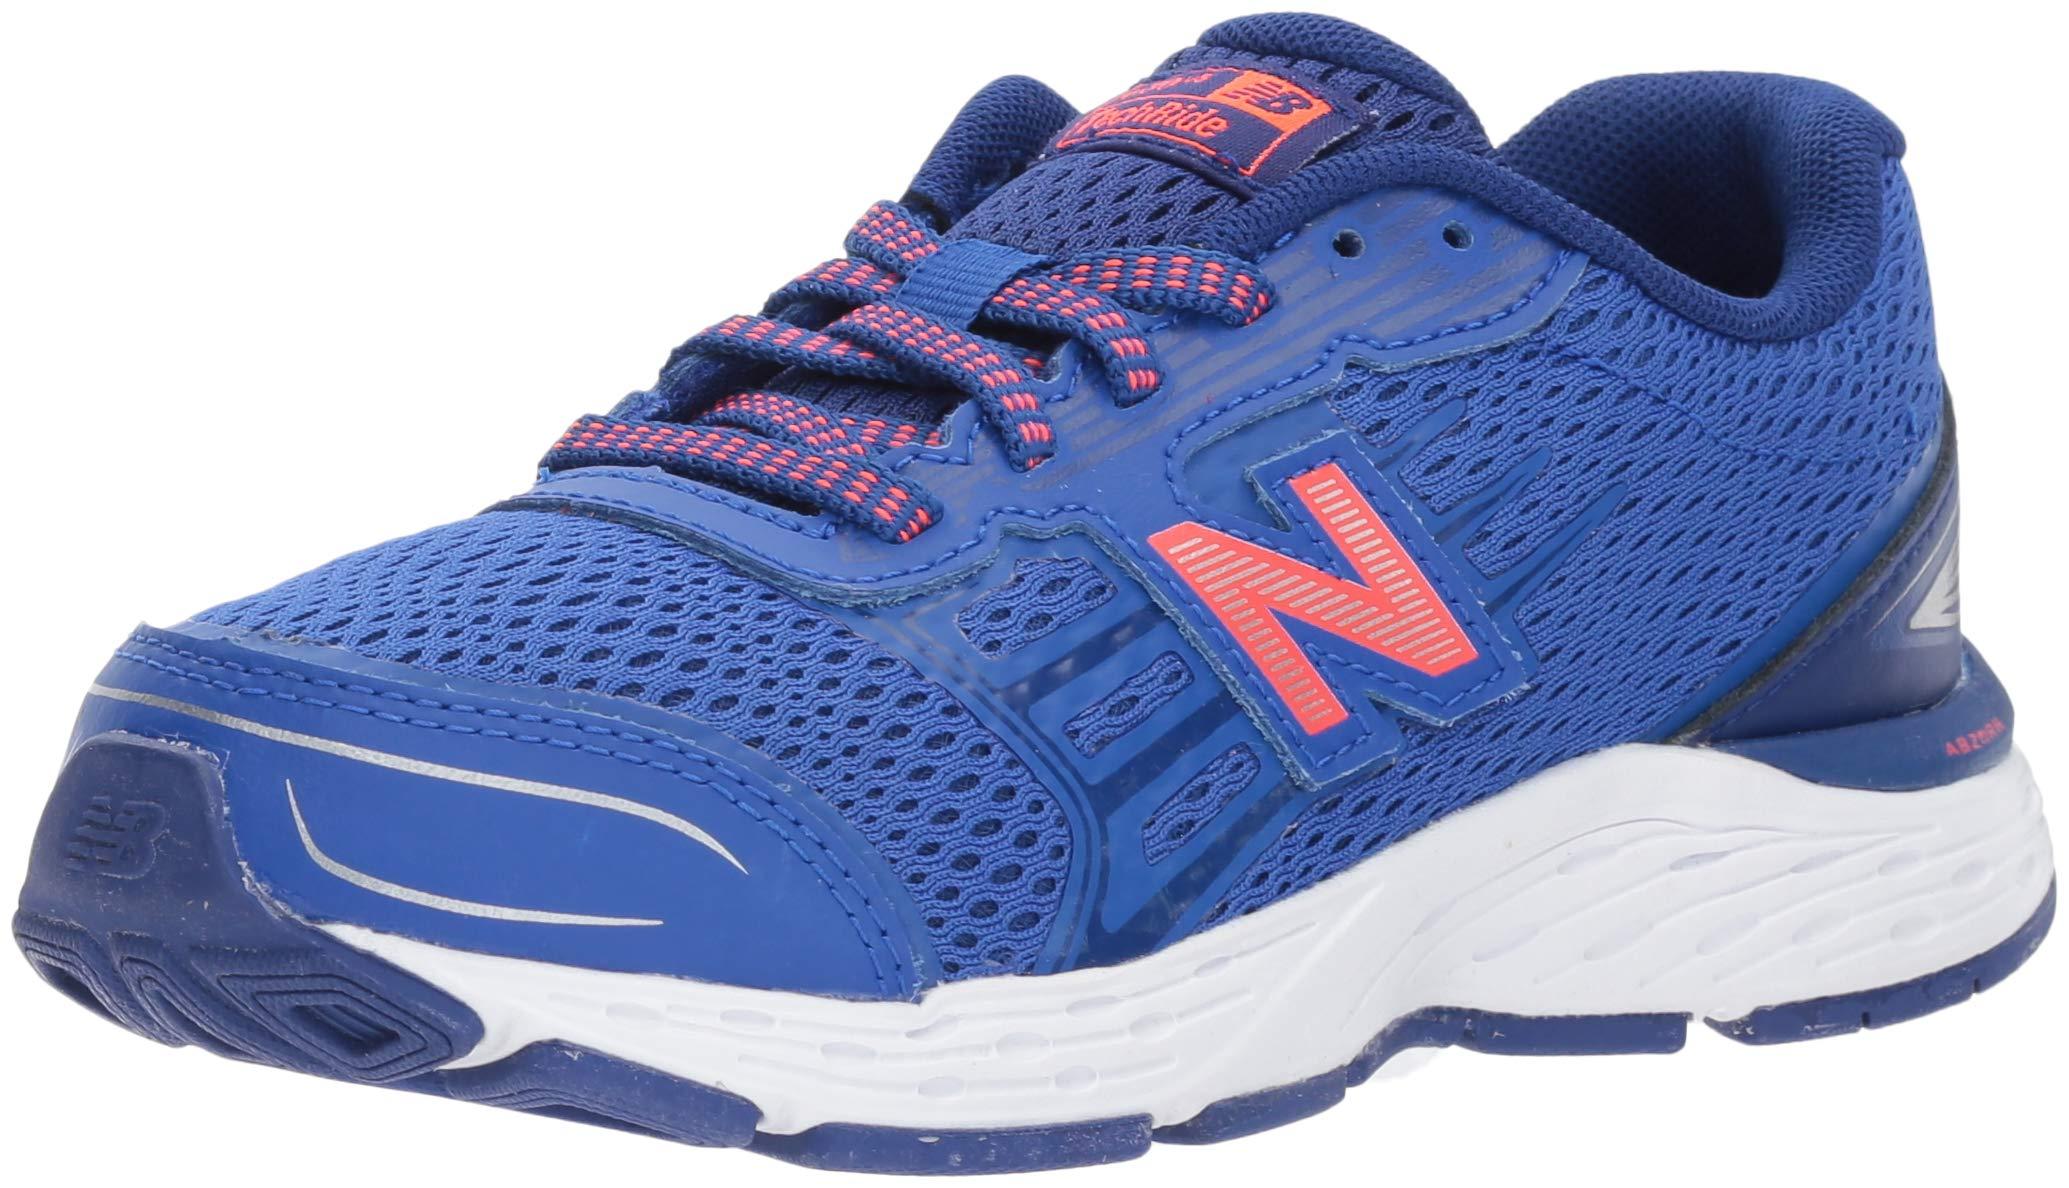 New Balance Boys' 680v5 Running Shoe, Pacific/Dynomite, 11.5 M US Little Kid